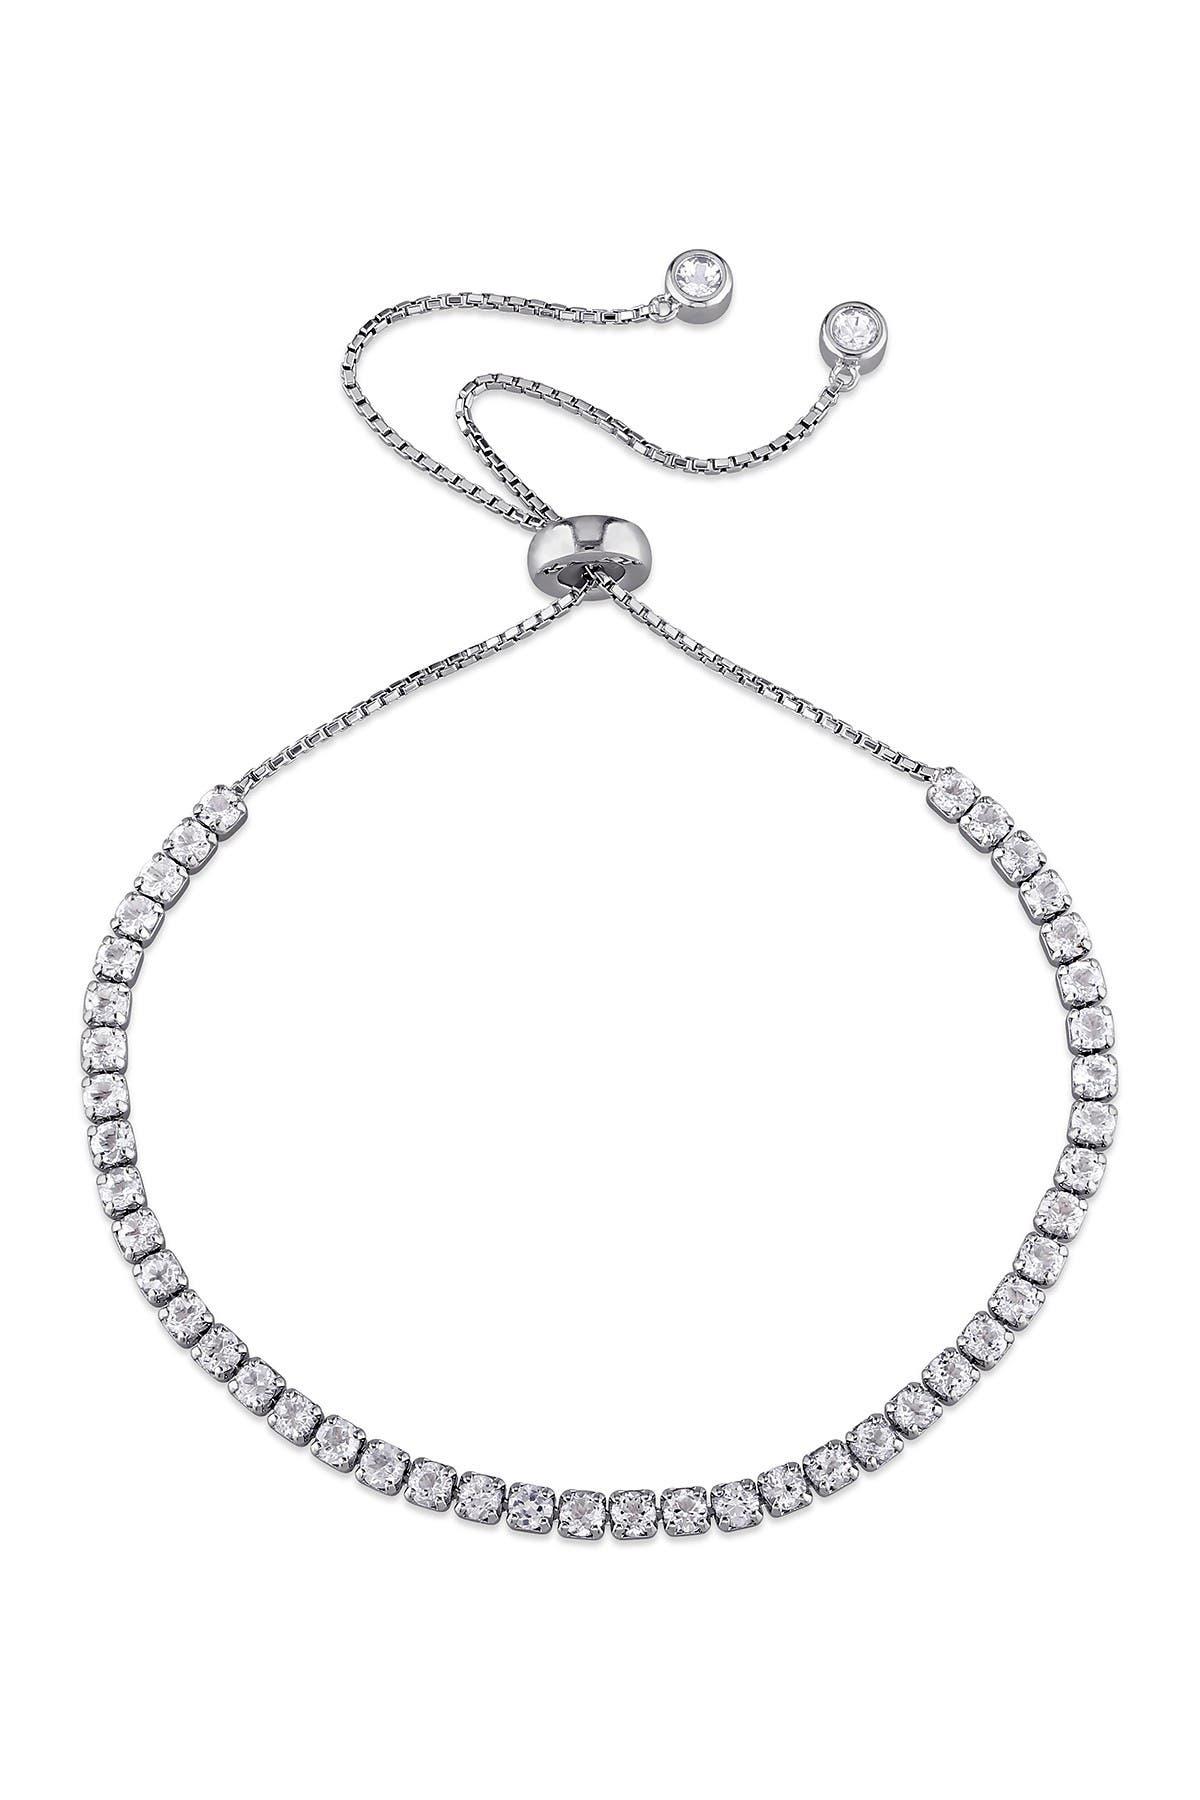 Image of Delmar Sterling Silver White Topaz Adjustable Tassel Bracelet